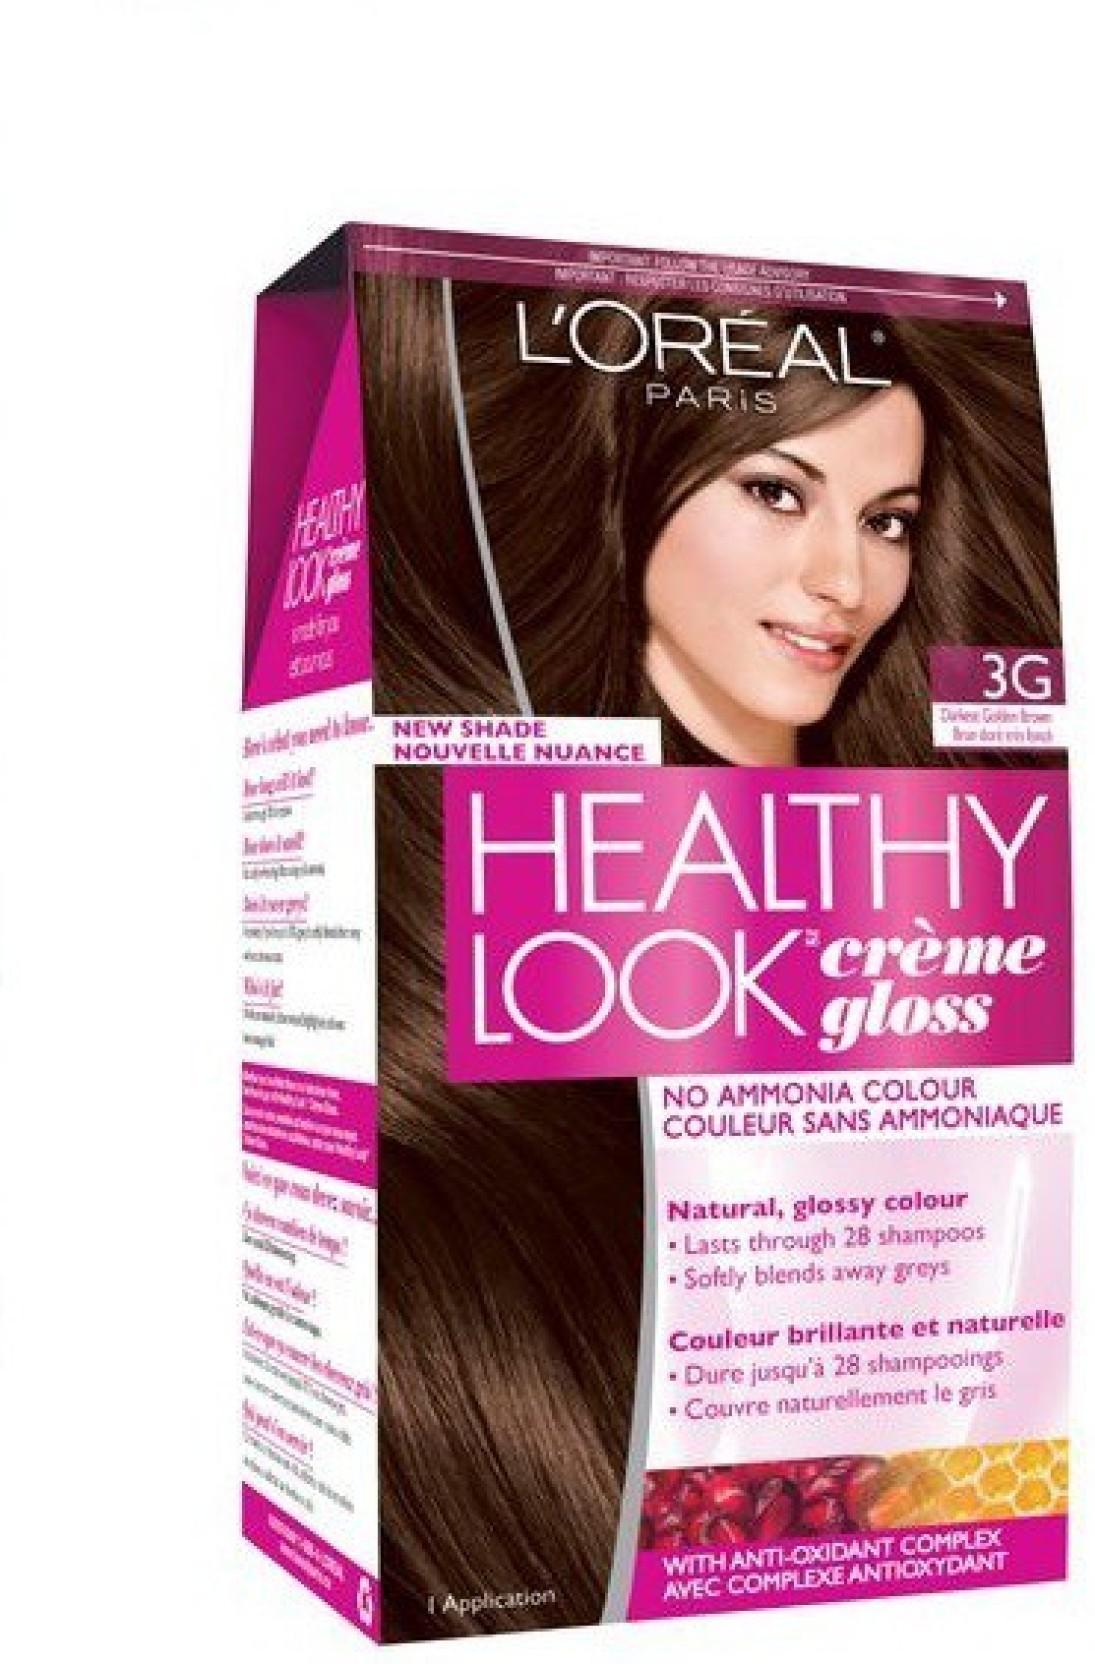 Loreal Paris Healthy Look Creme Gloss No Ammonia Hair Color